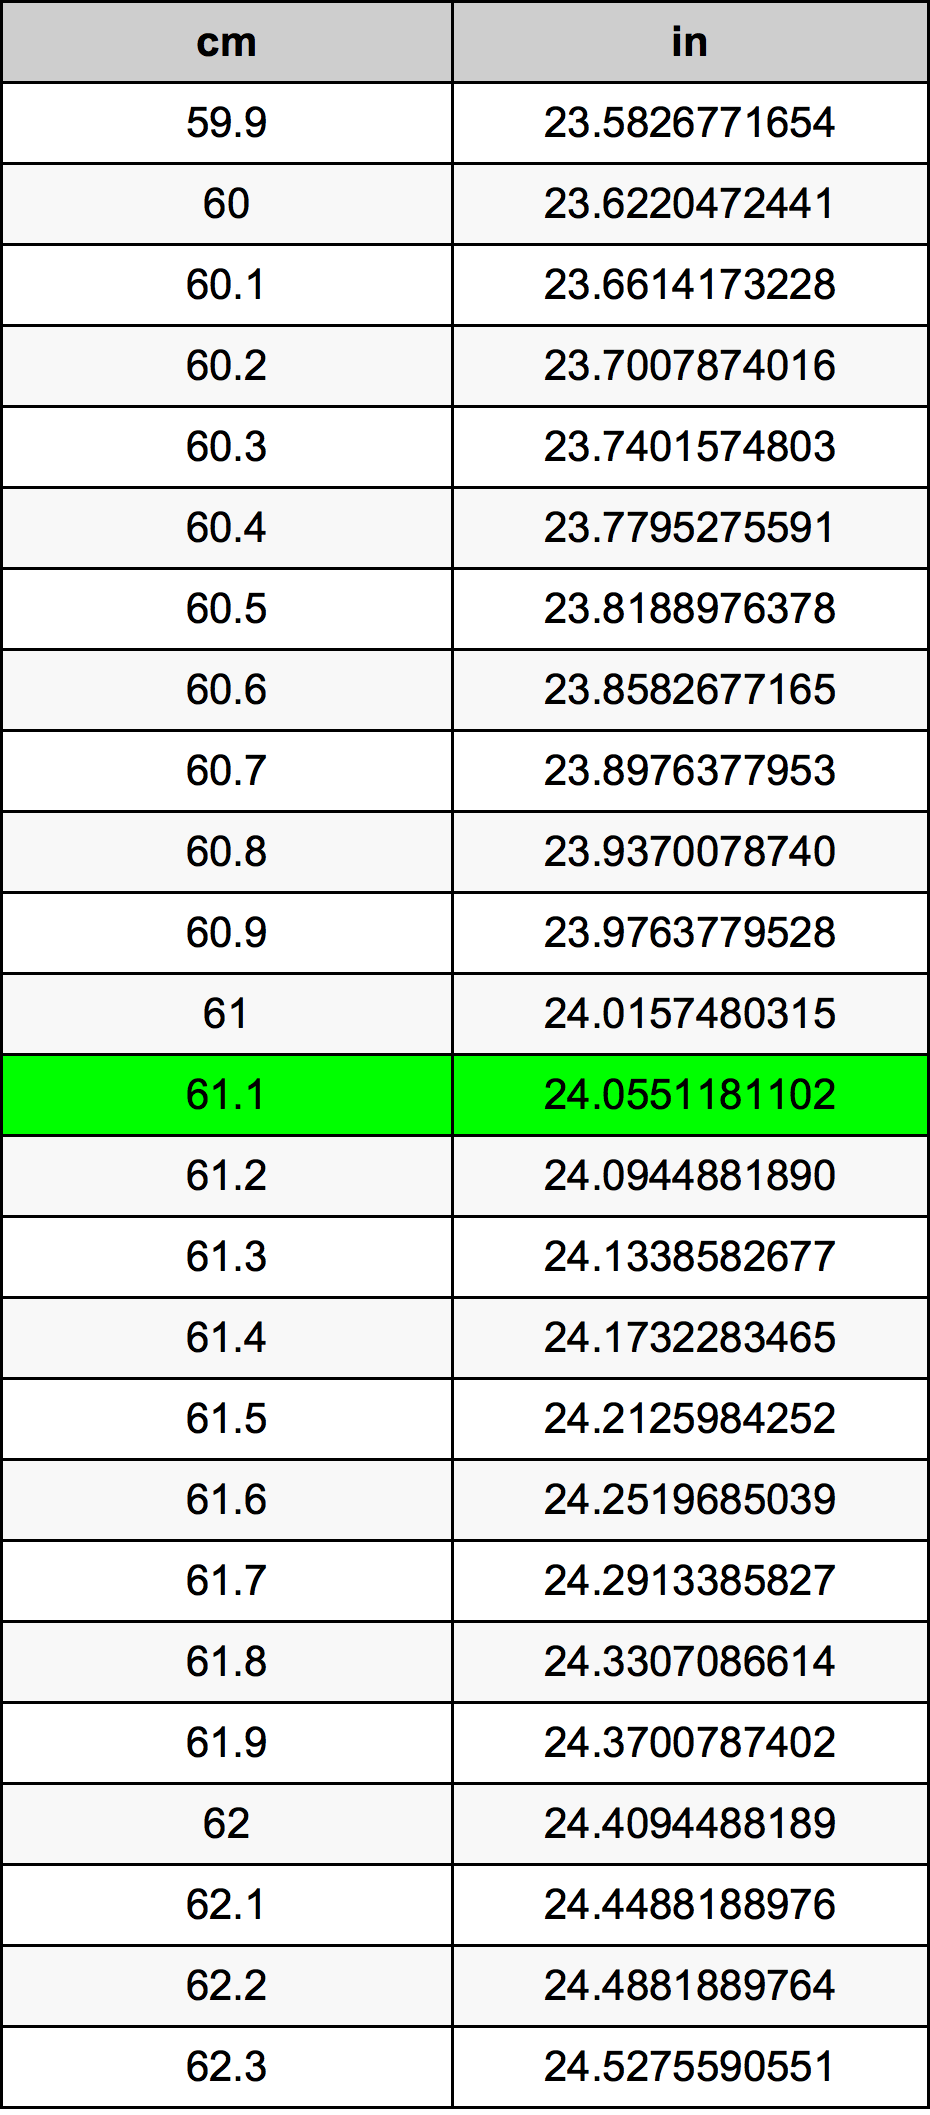 61.1 Centimeter konverteringstabellen